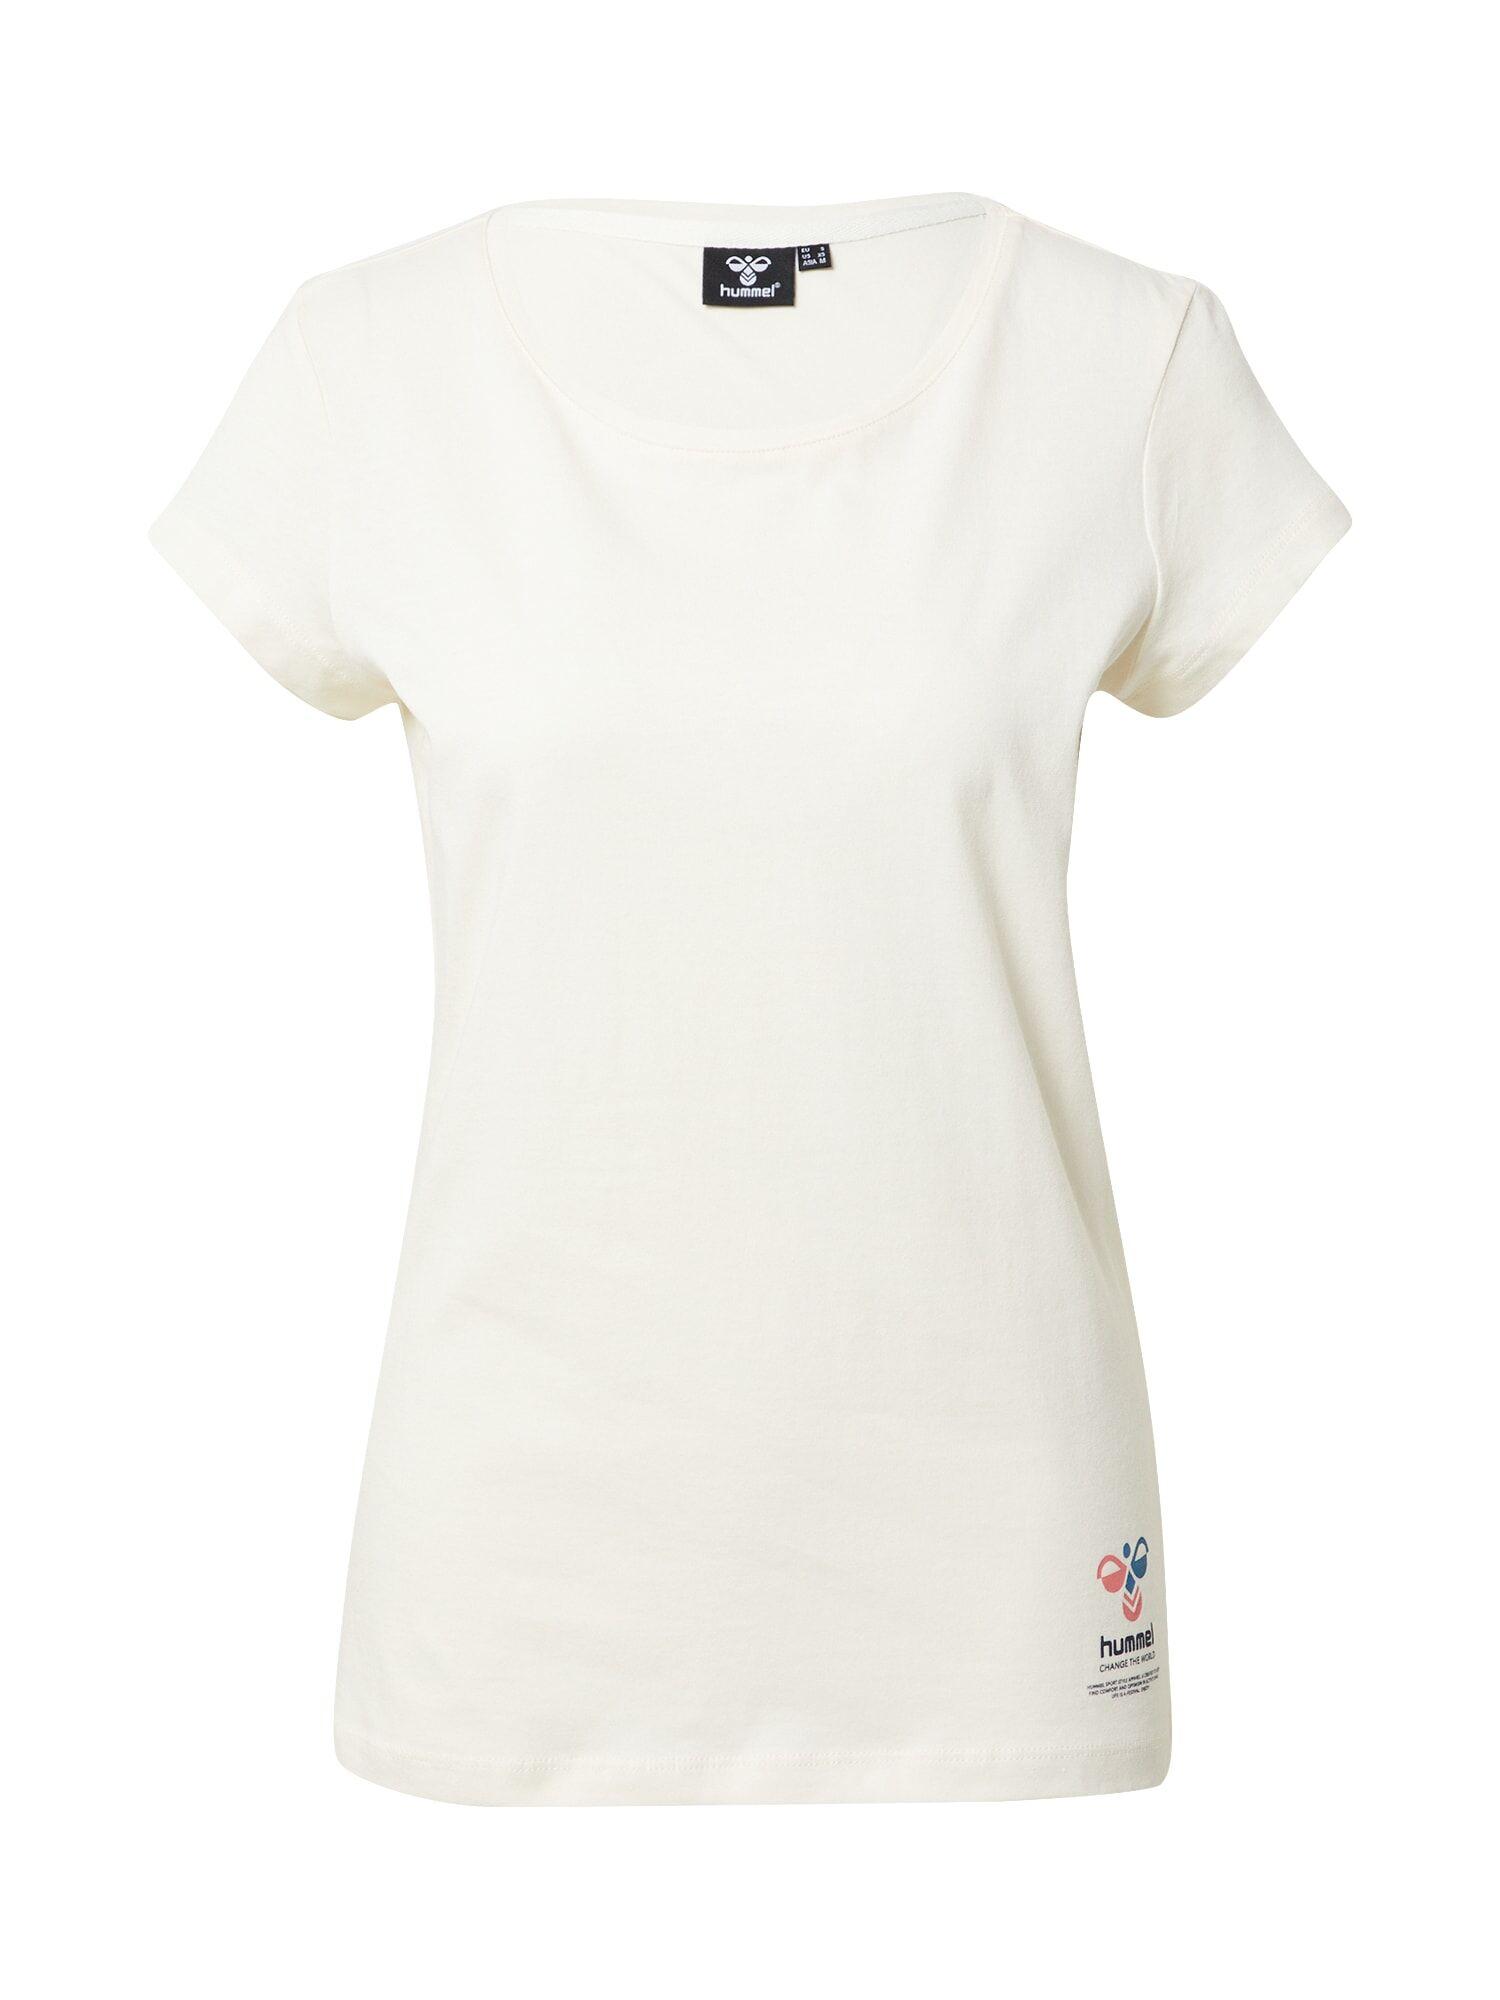 Hummel T-shirt fonctionnel 'Scarlett'  - Blanc - Taille: XL - female